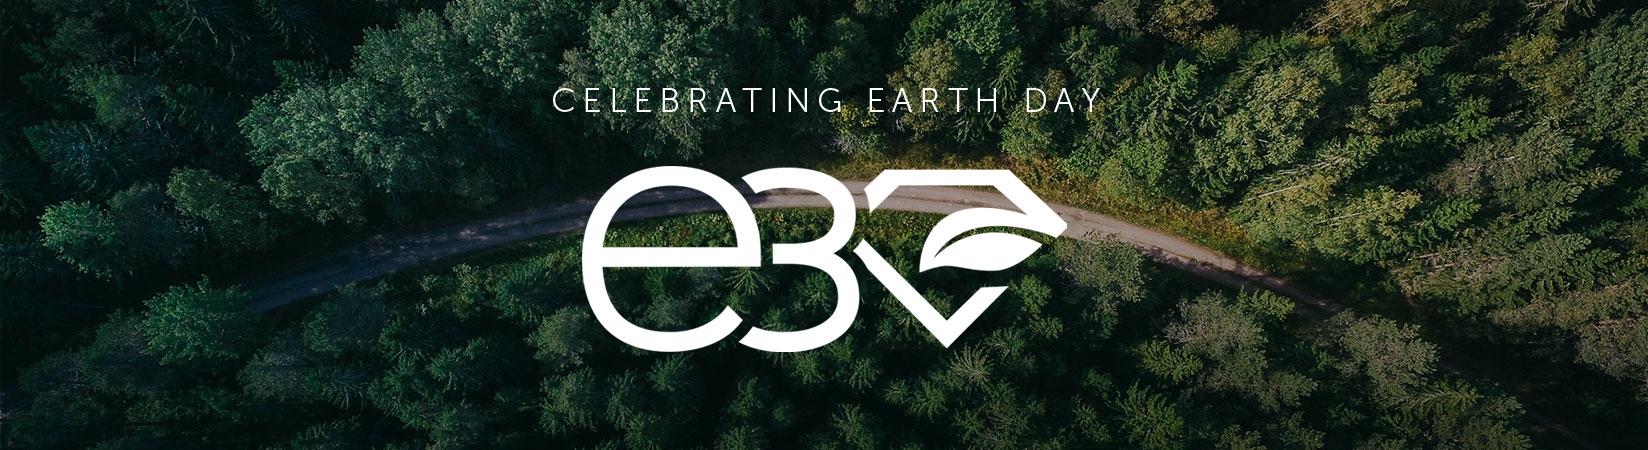 E3 Earth Day